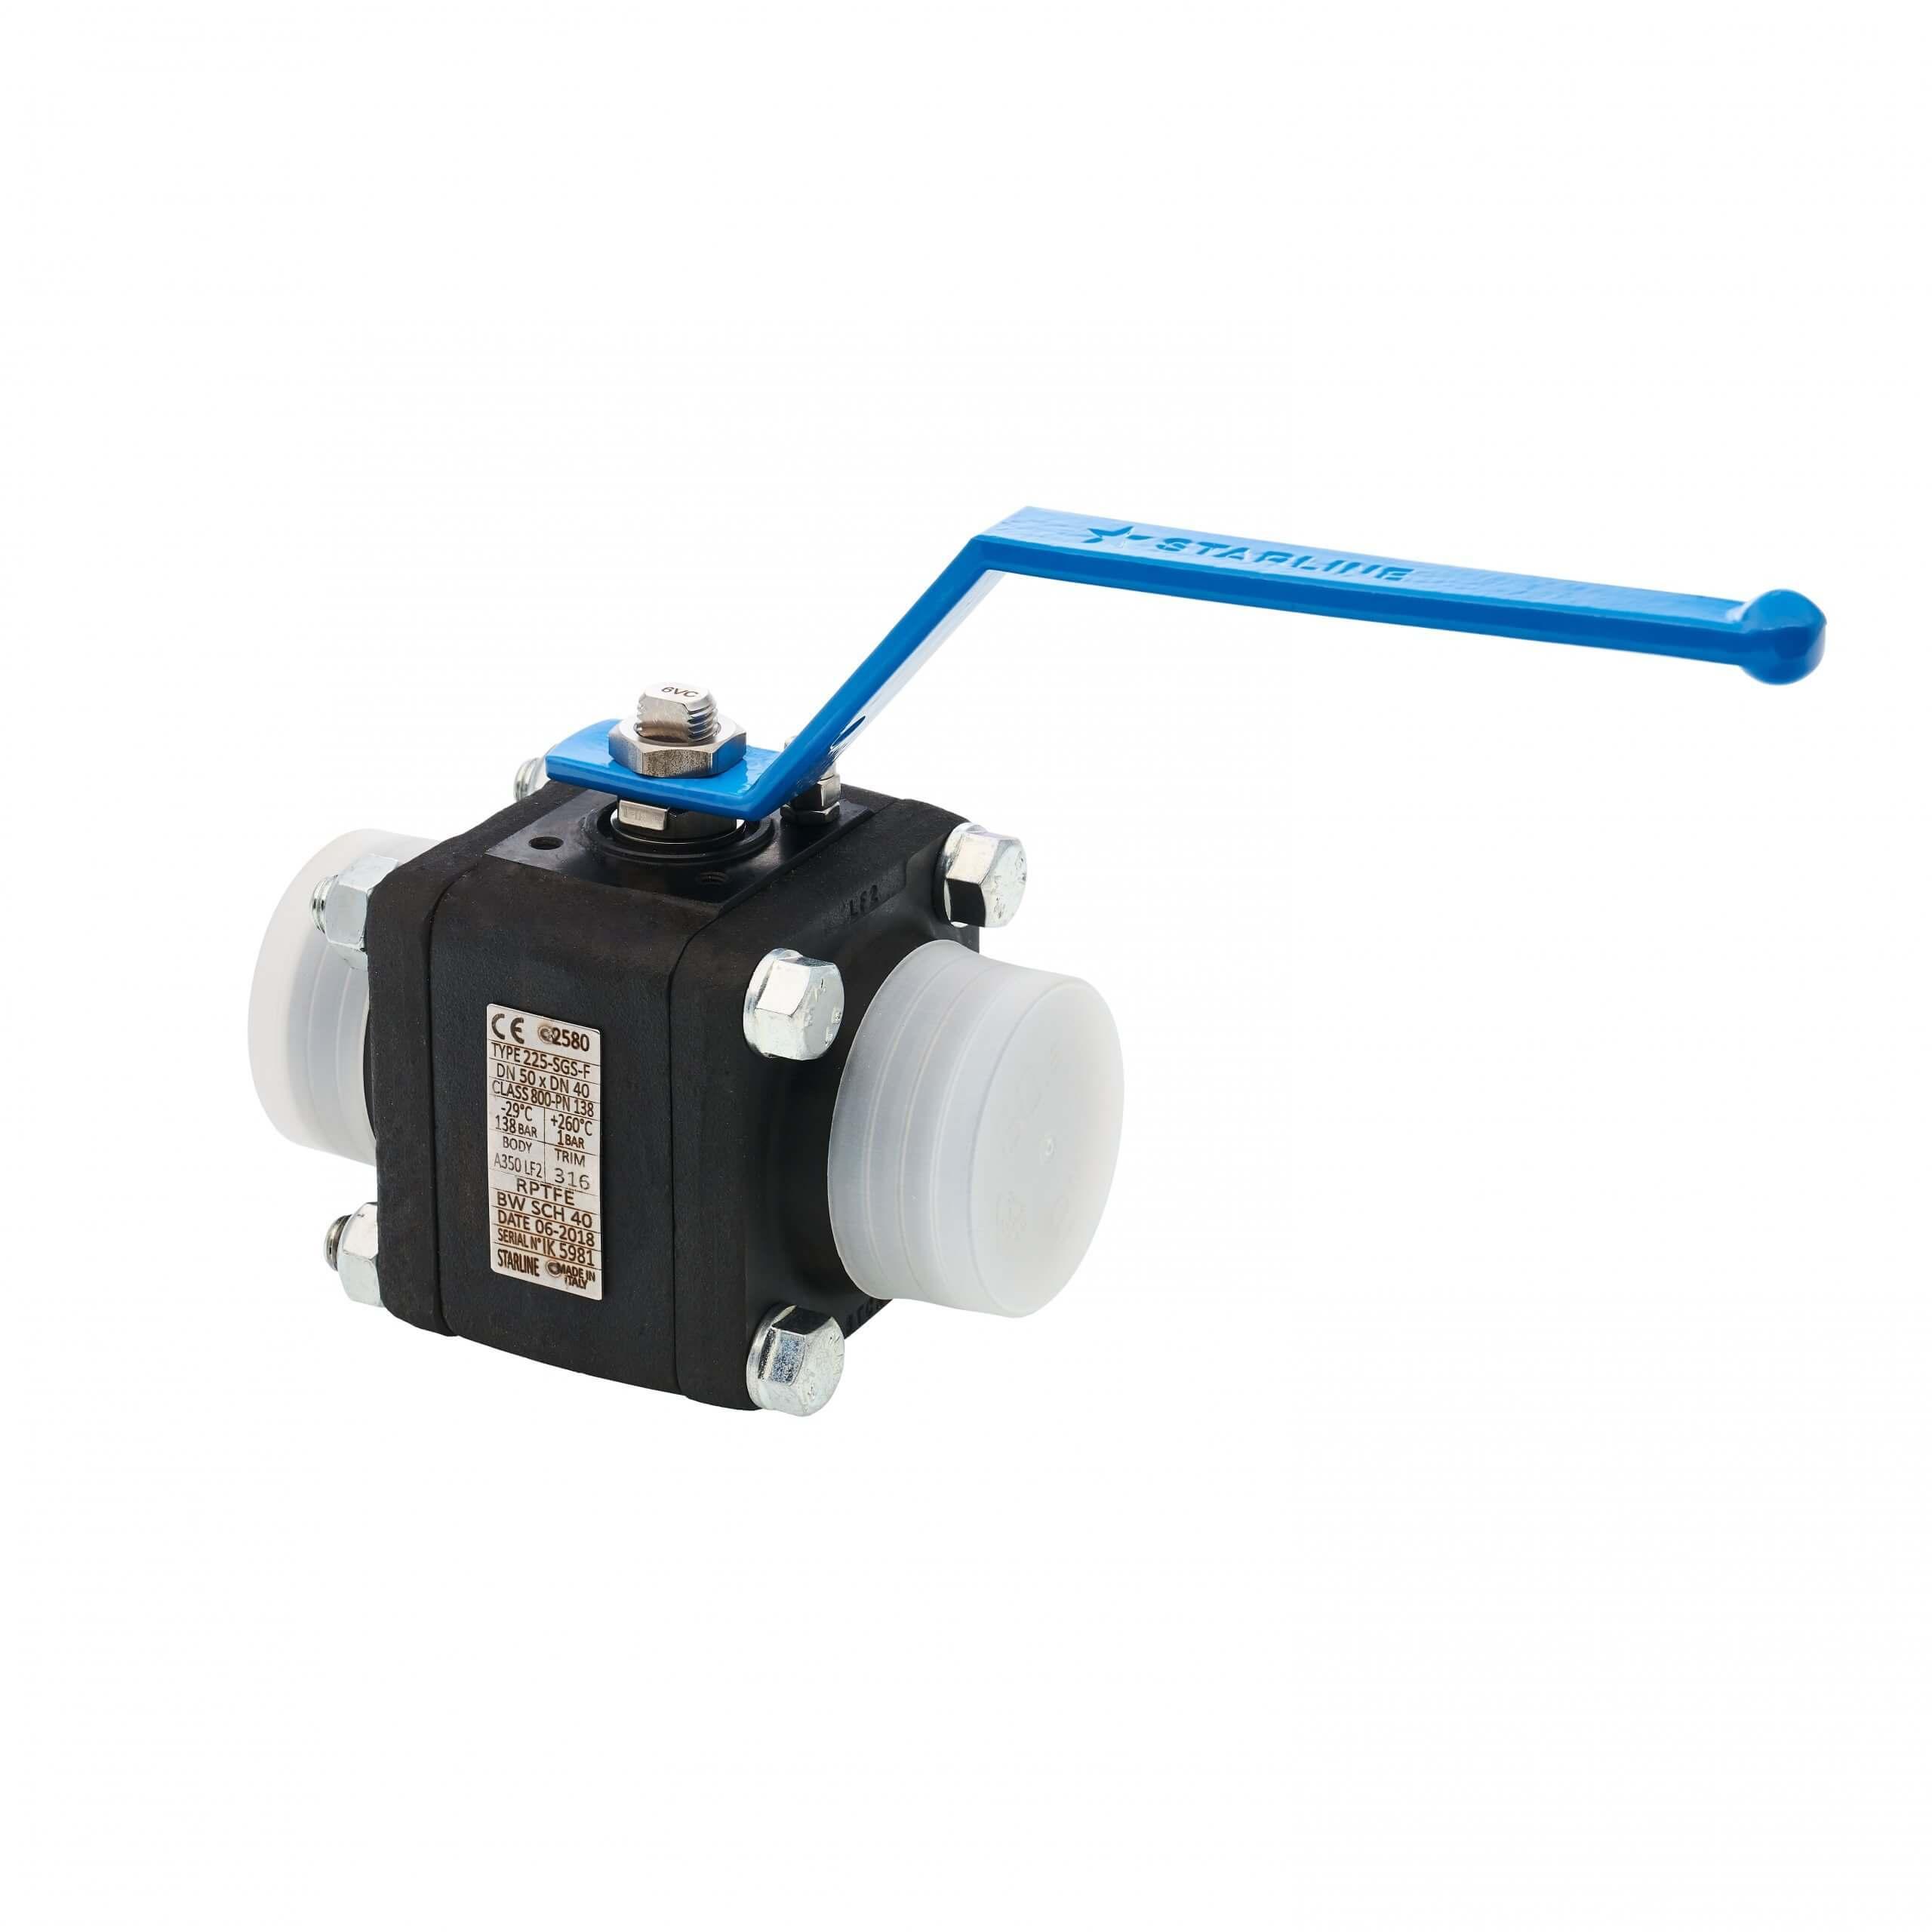 Valves - Shut-off valve